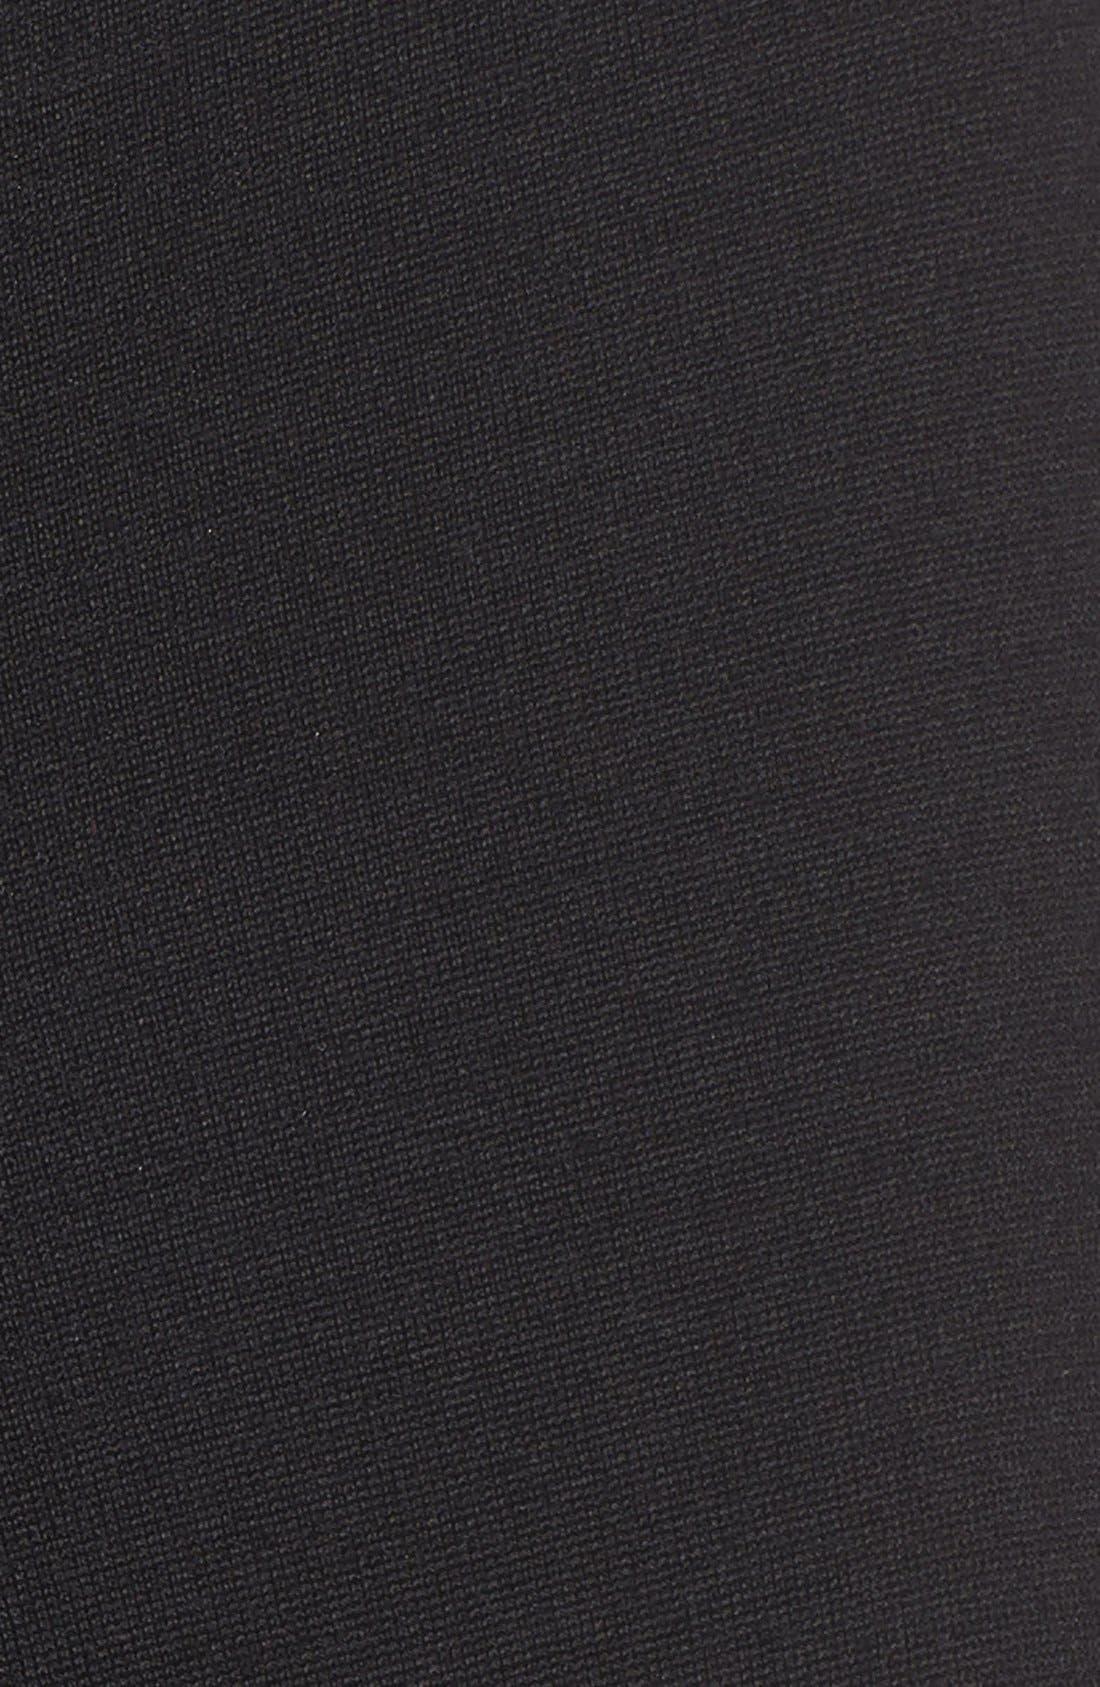 SAXX,                             'Black Sheep' Moisture Wicking Long Underwear,                             Alternate thumbnail 5, color,                             019